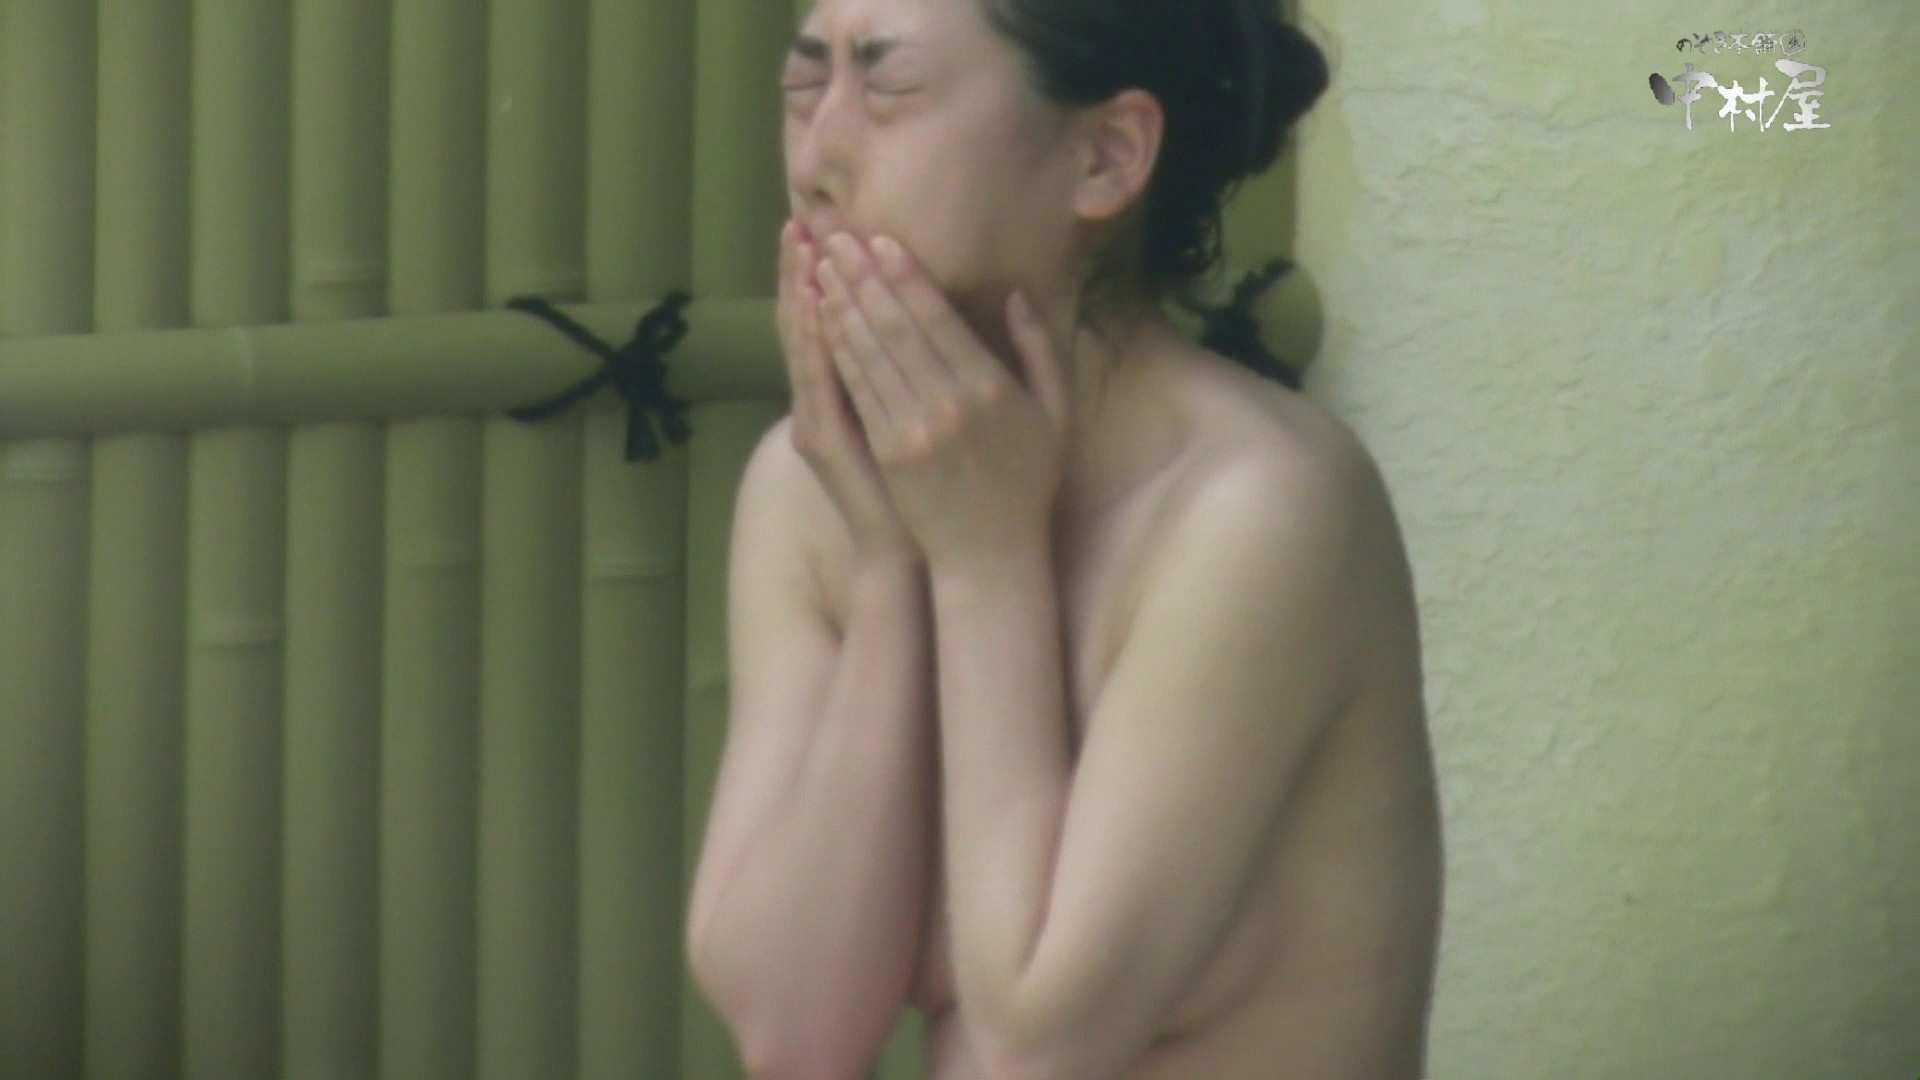 Aquaな露天風呂Vol.888 盗撮 エロ無料画像 77画像 74